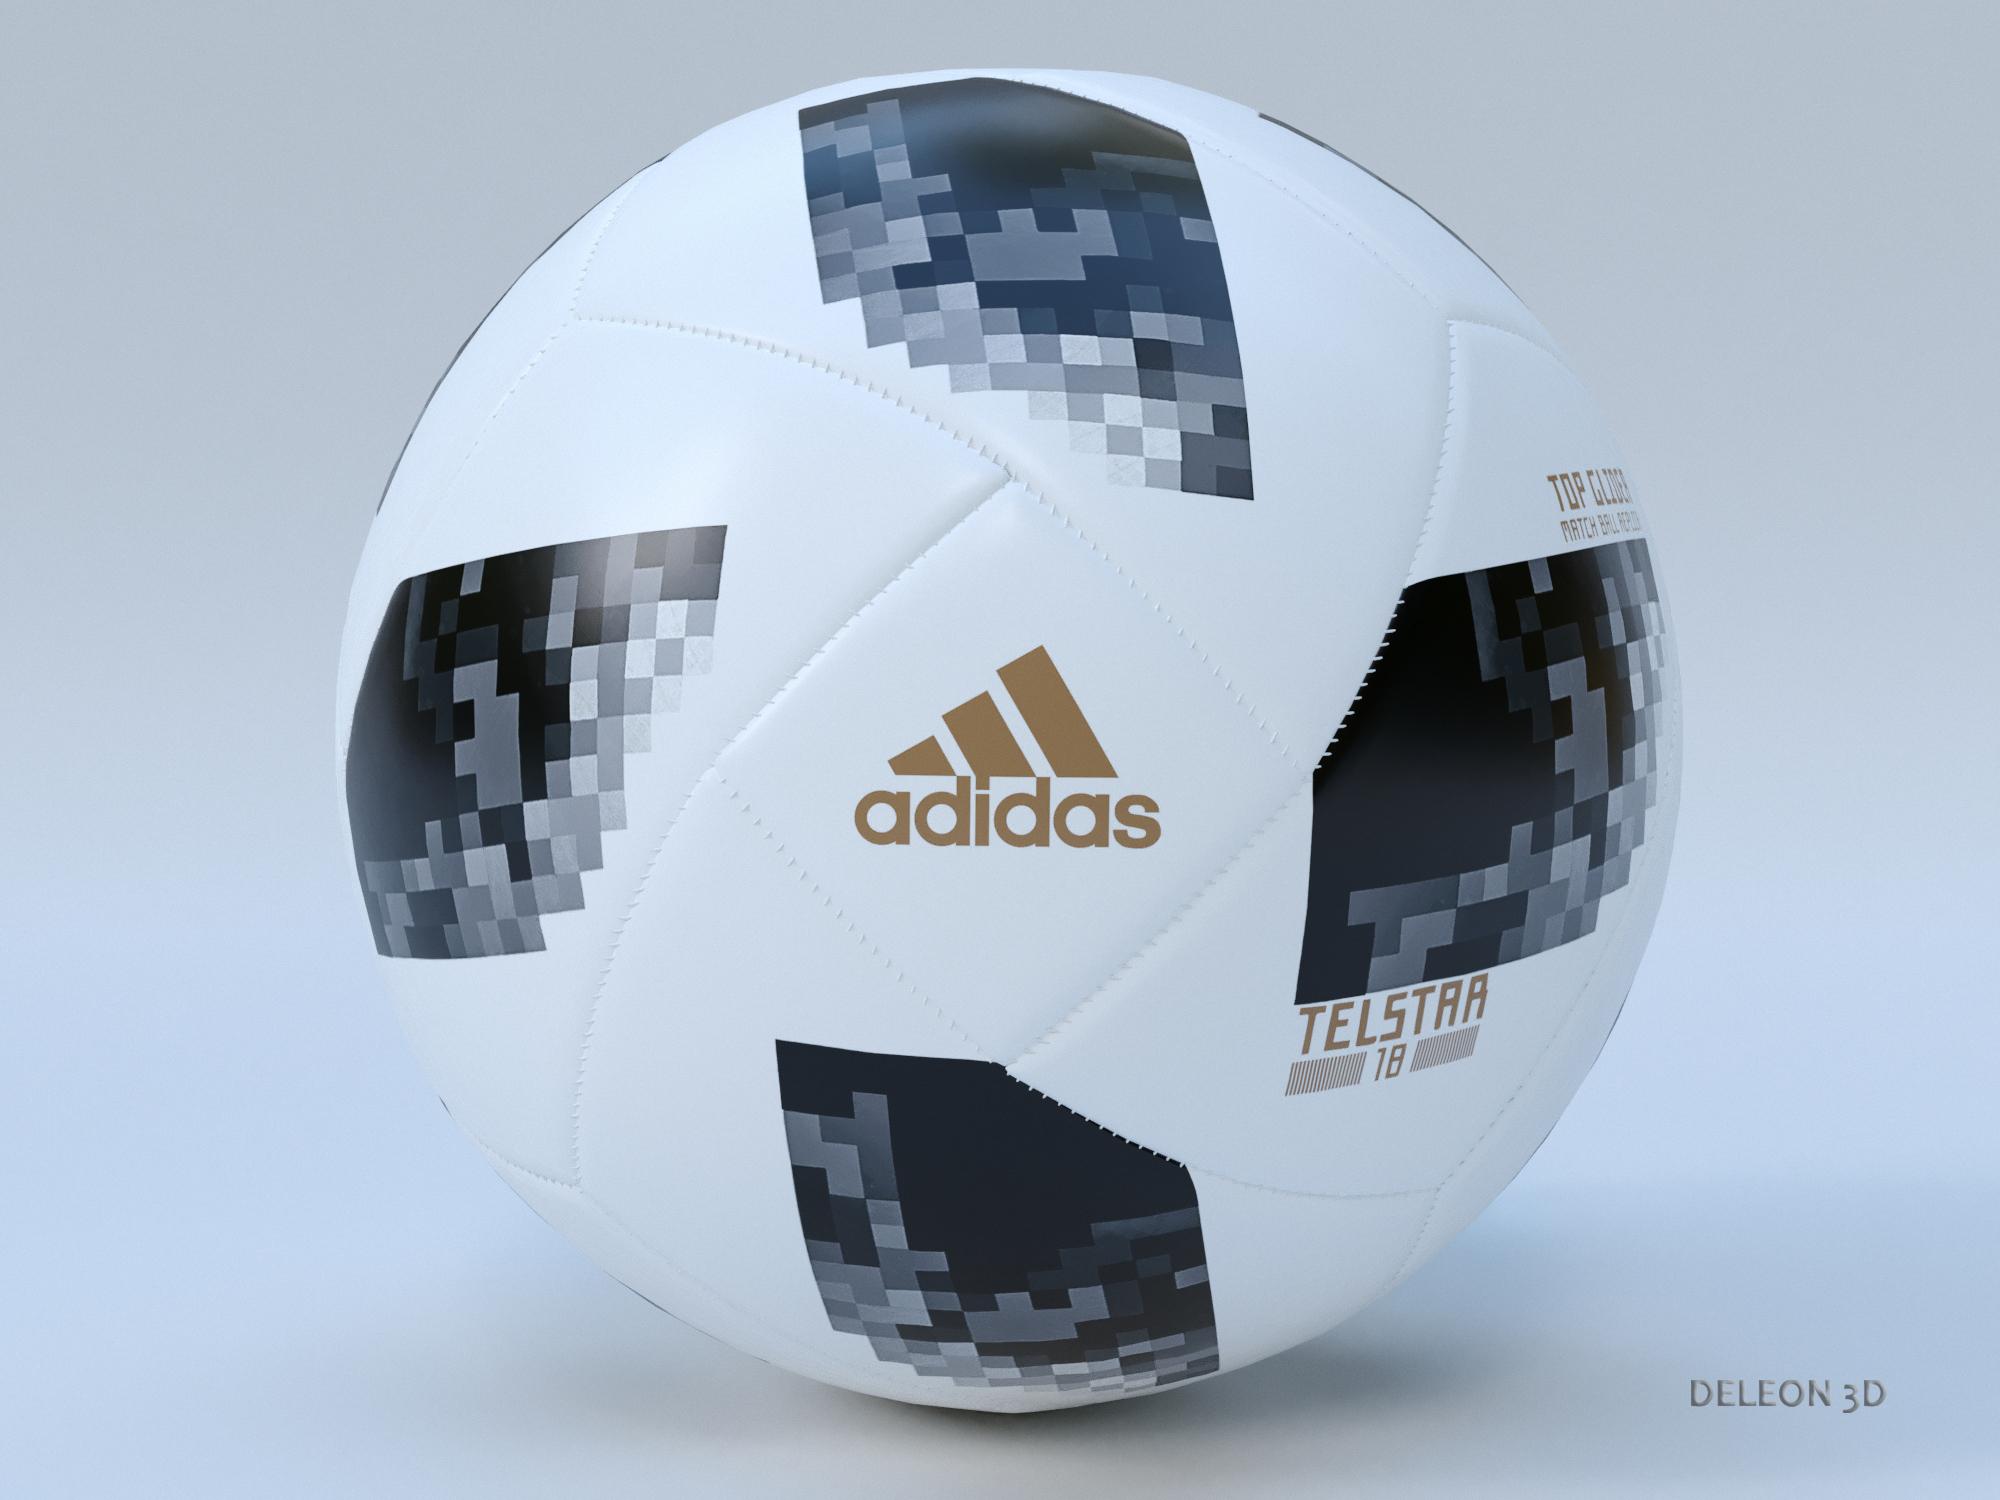 soccer ball adidas 2018 fifa world cup russia 3d model max max max lxo fbx c4d jpeg stl obj 281442